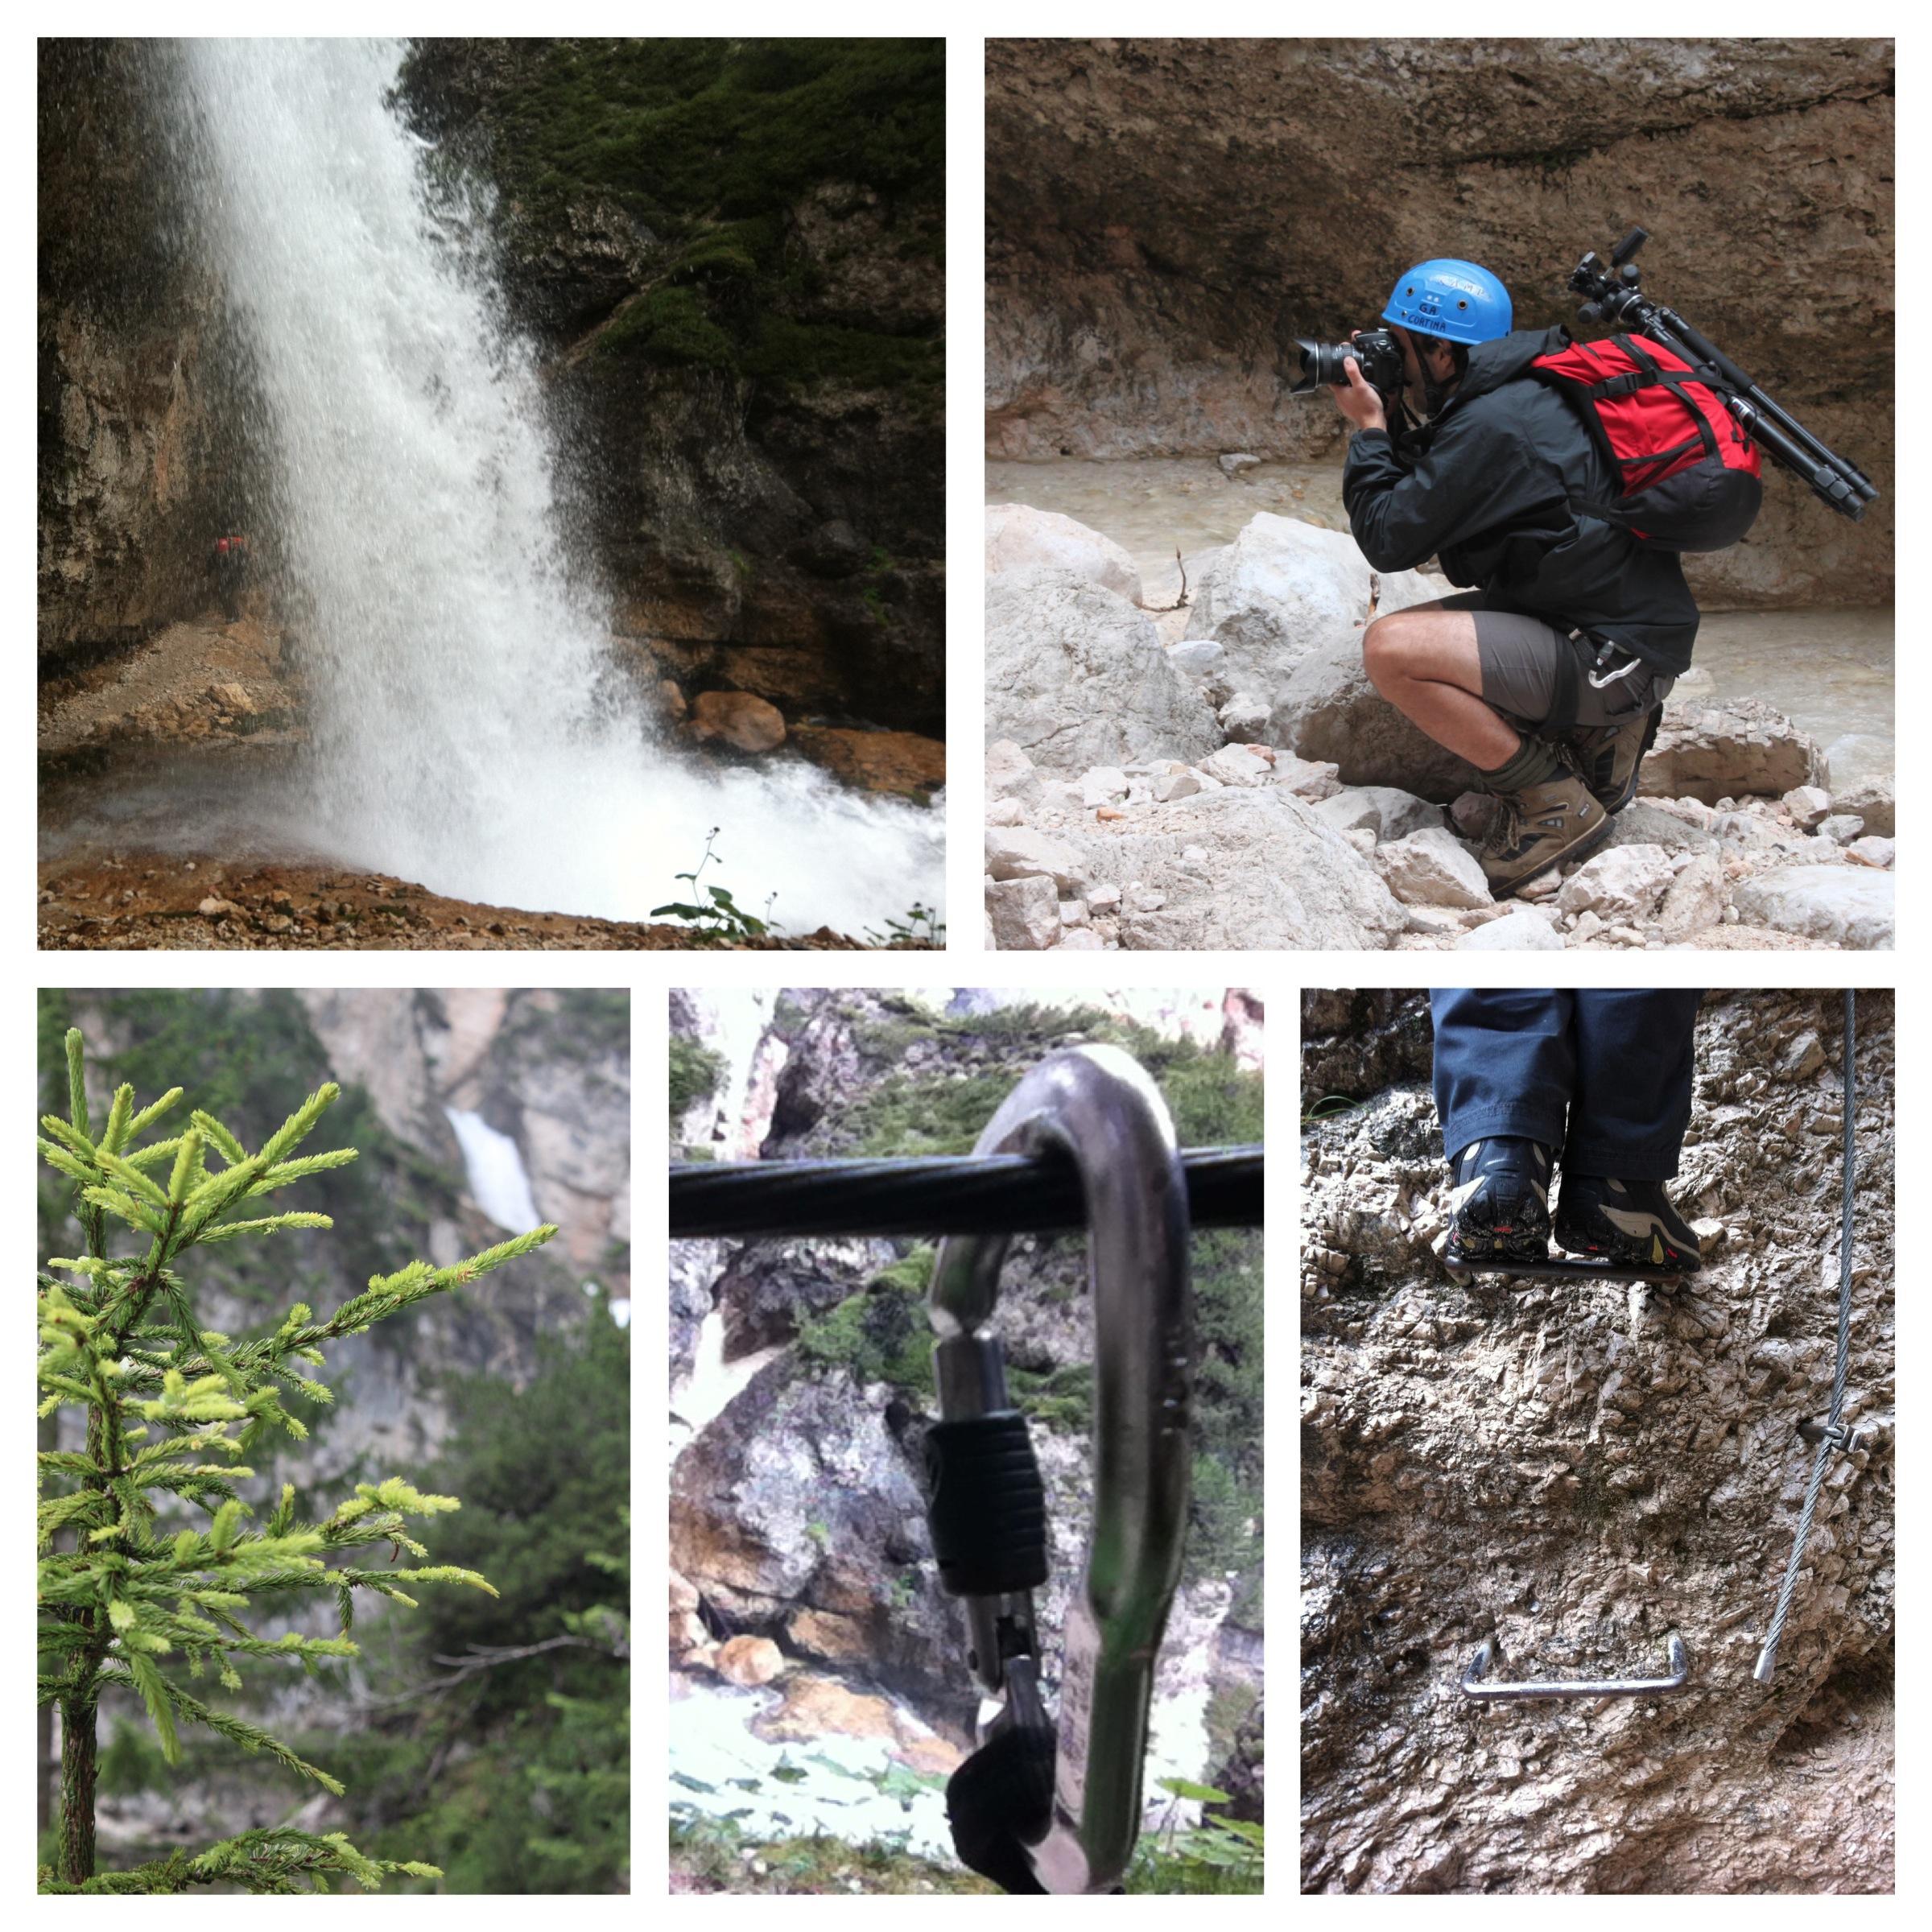 camminata cortina hiking trip cascata dolomiti d'ampezzo